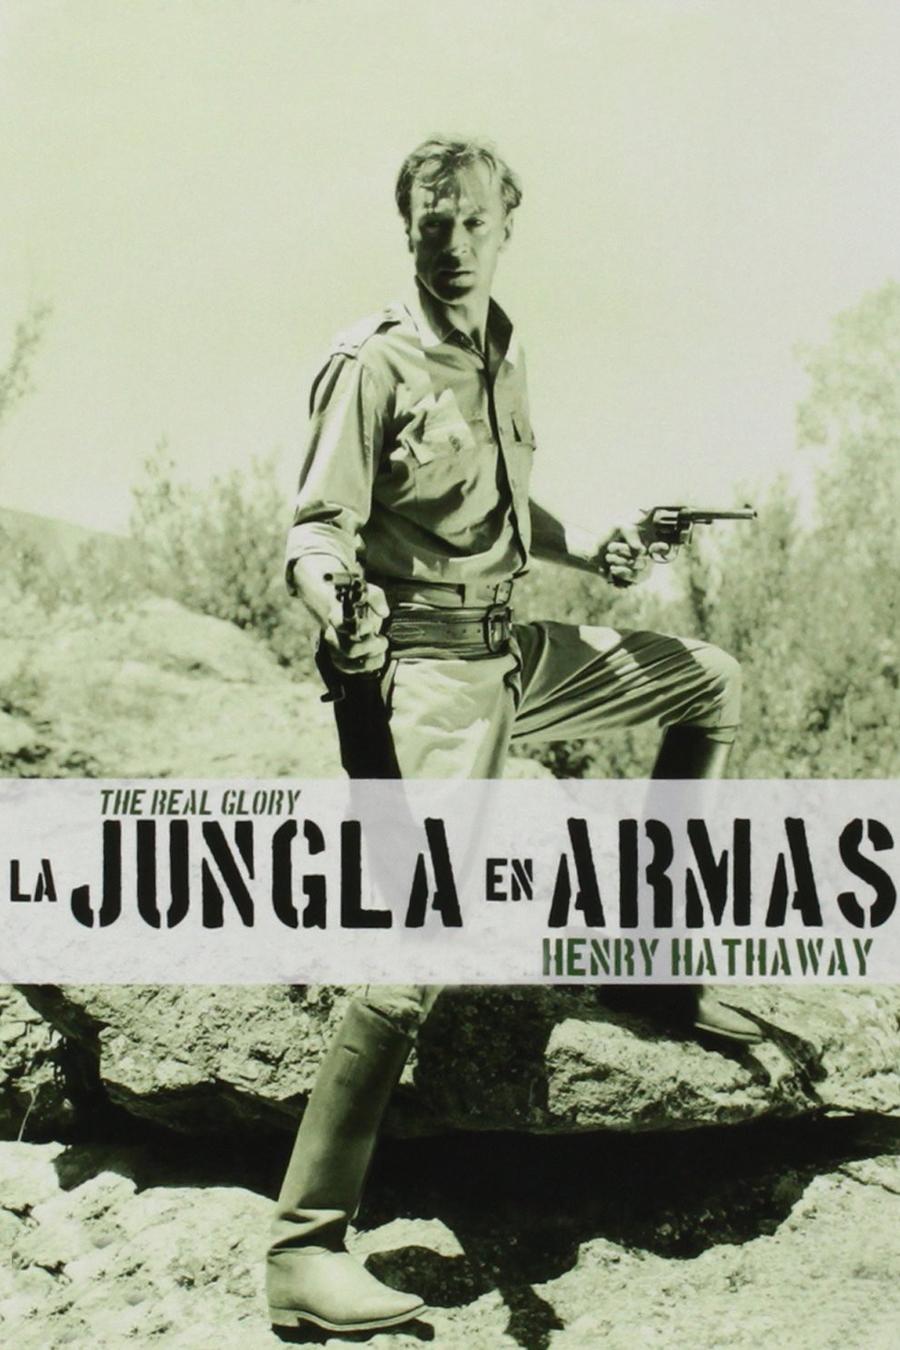 La jungla en armas